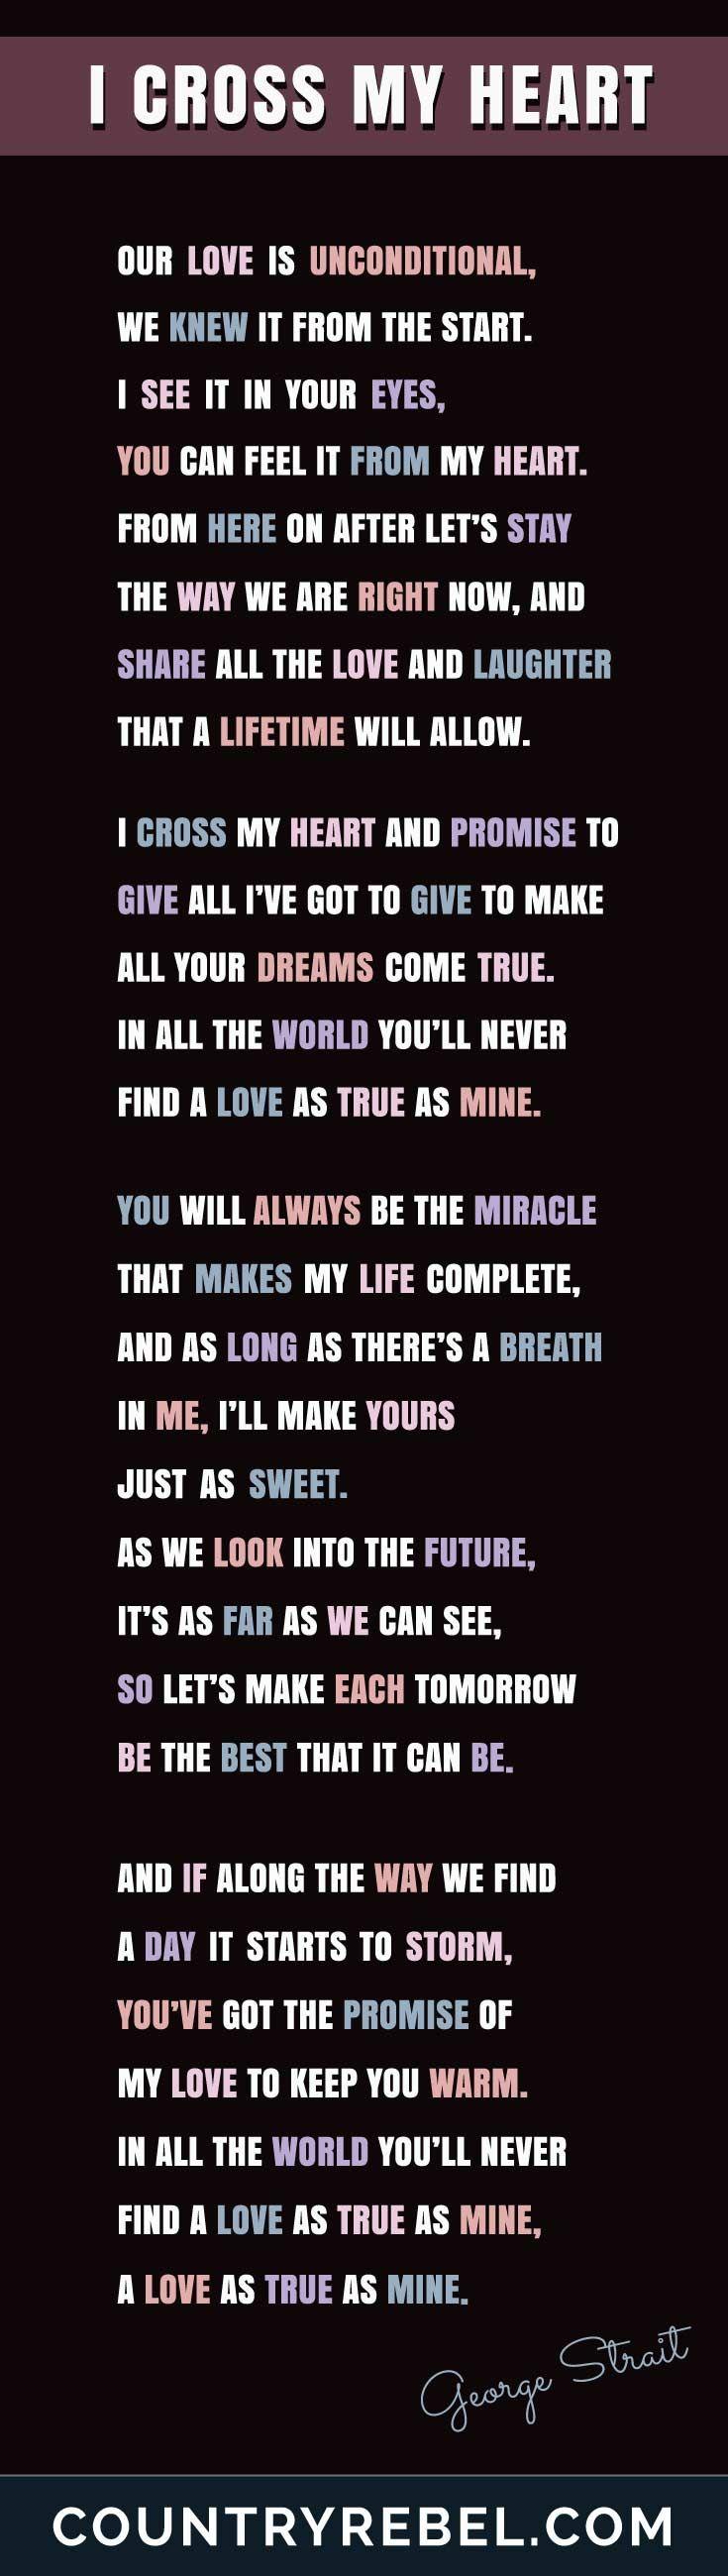 George Strait ~ I Cross My Heart!